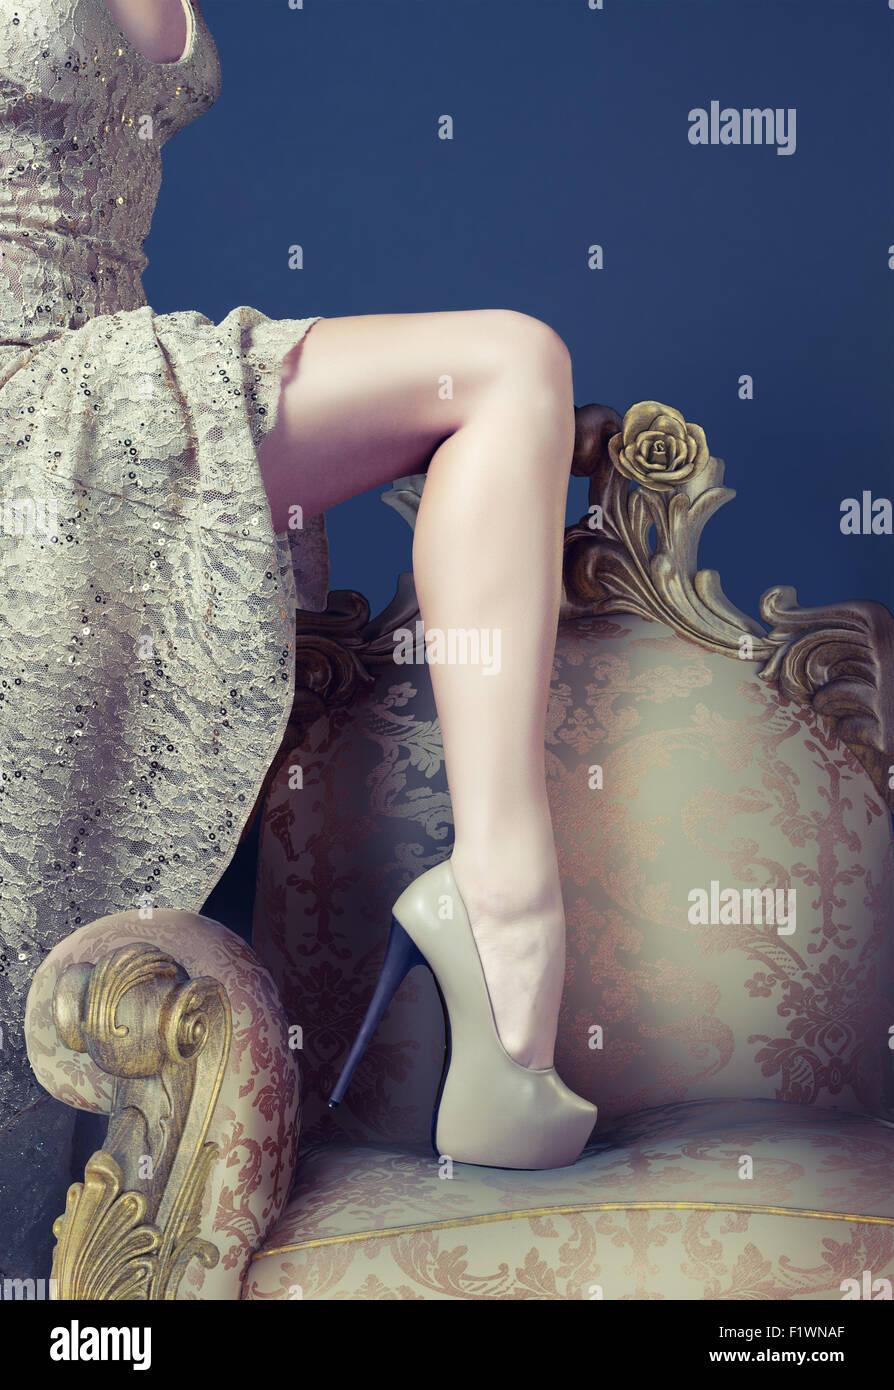 Beautiful slim leg on the luxury vintage armchair - Stock Image